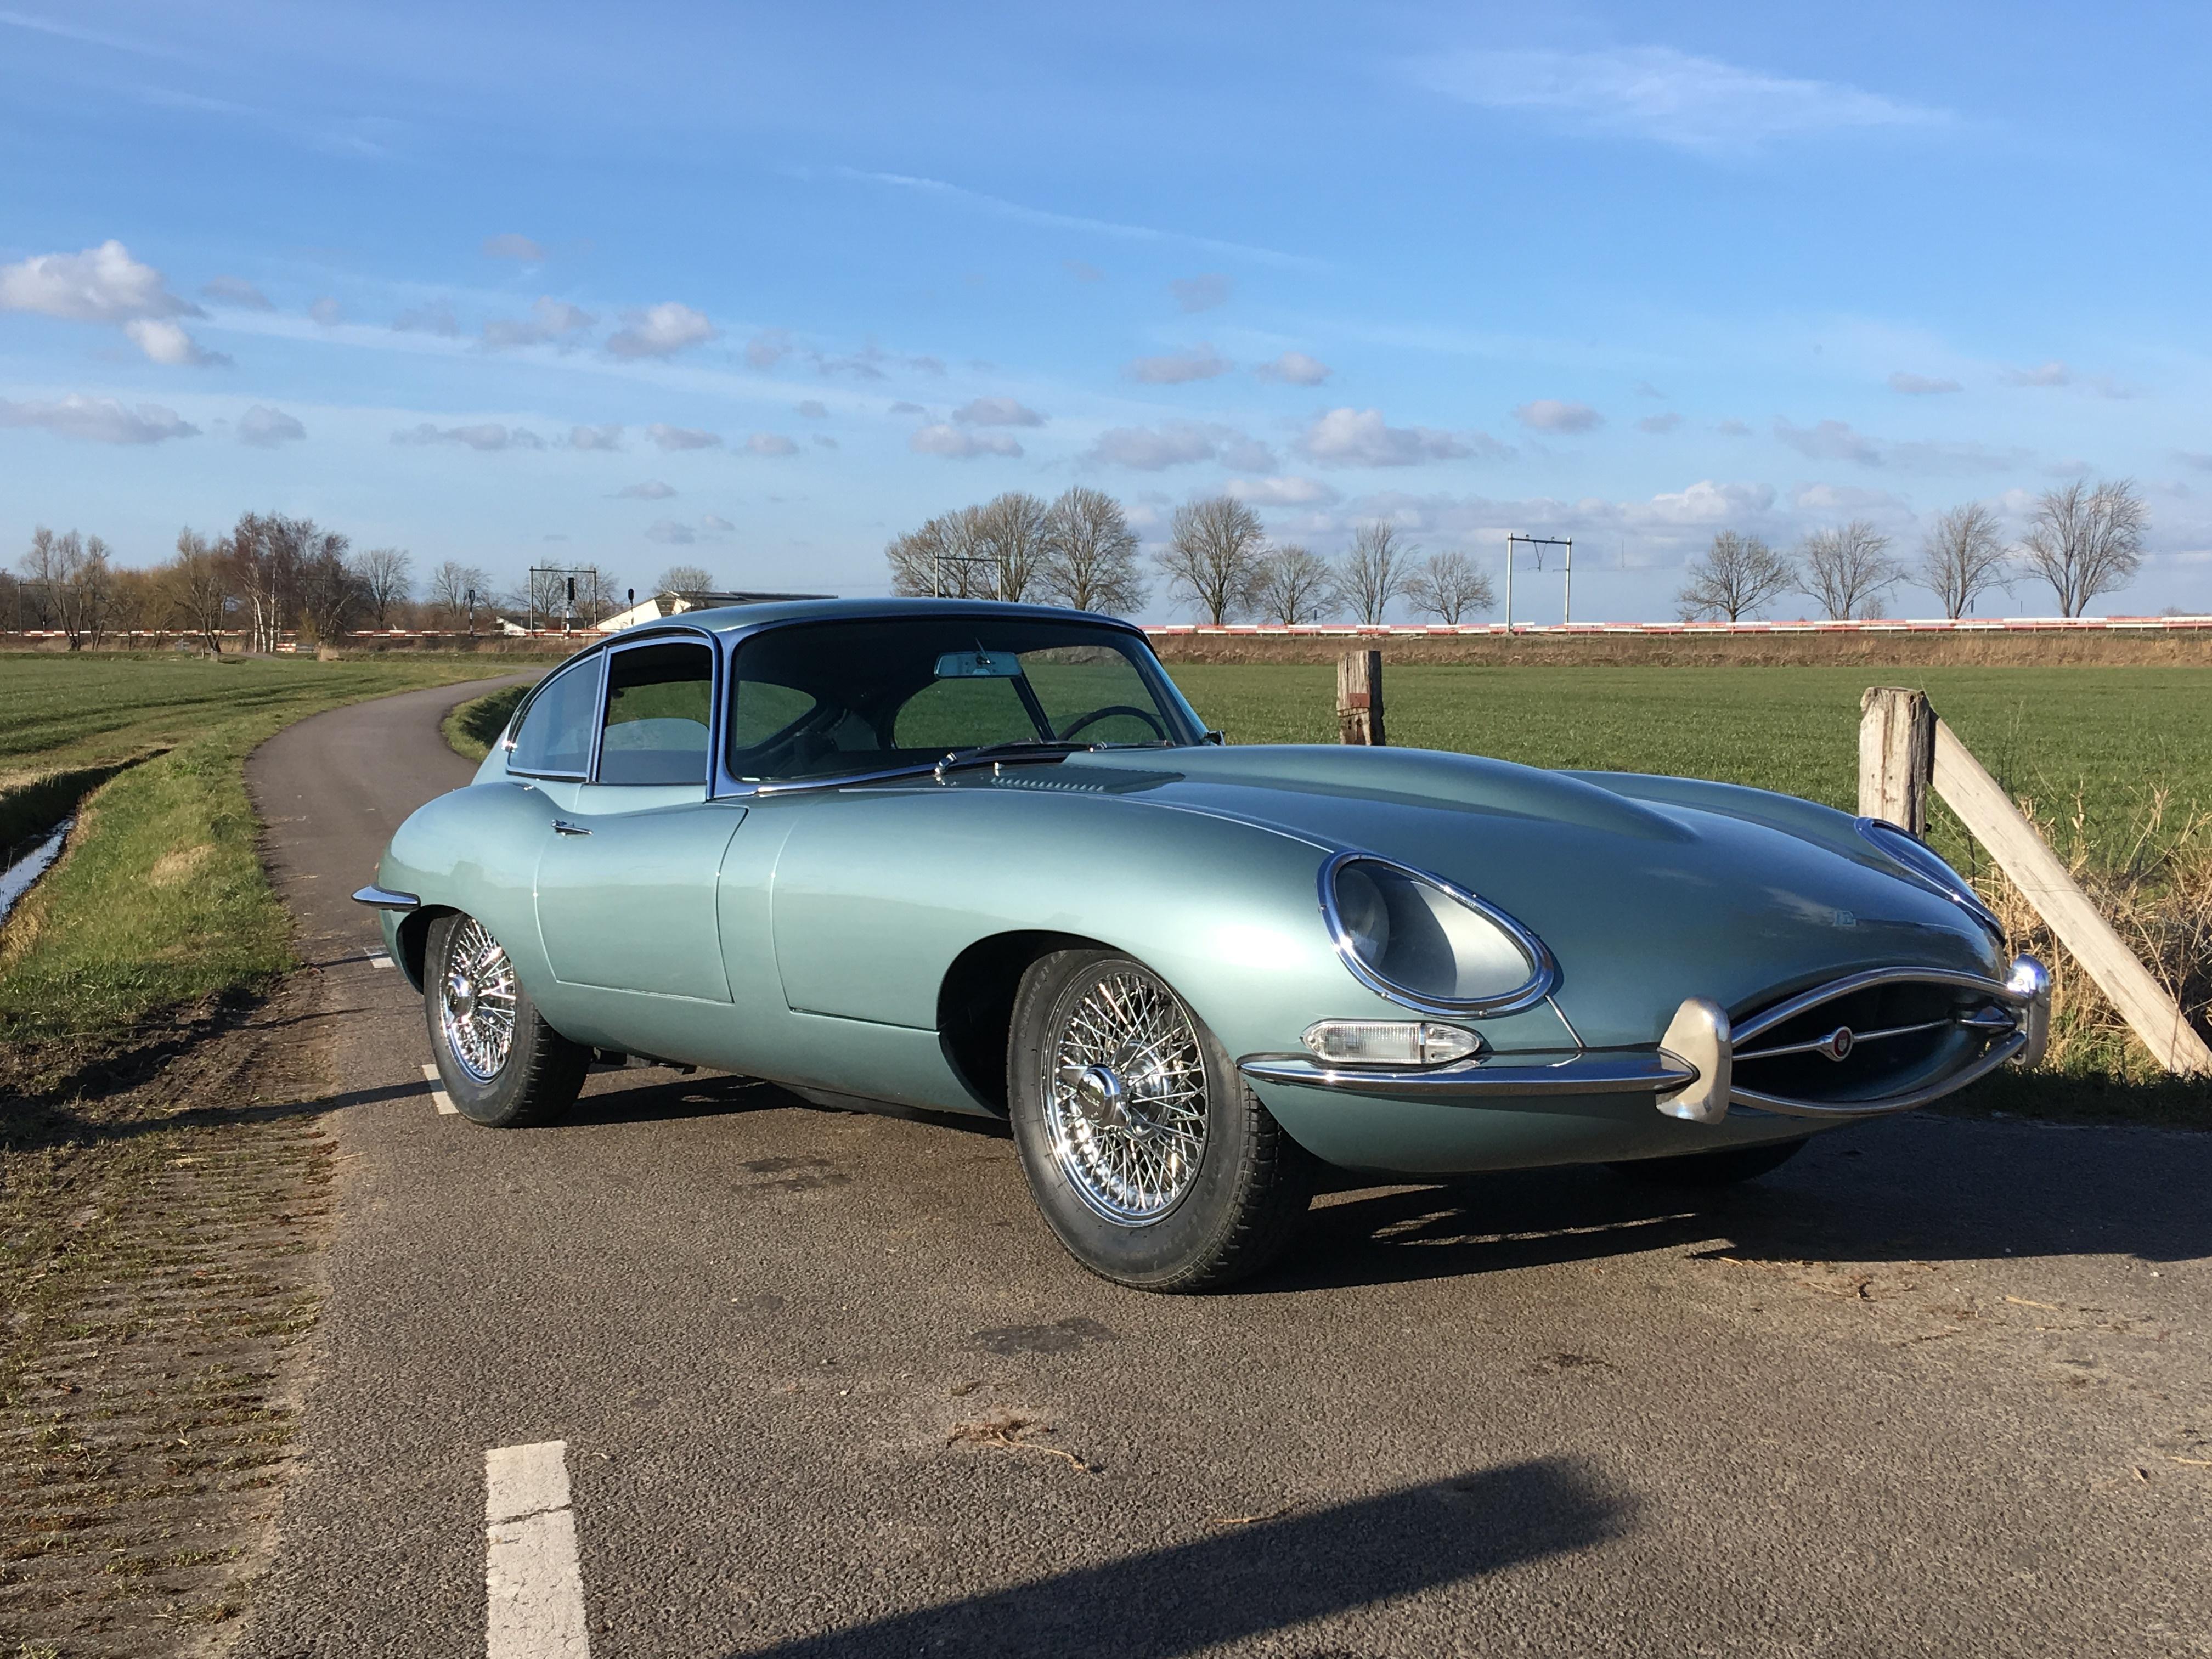 replica sale ss car classic for youtube auction jaguar watch